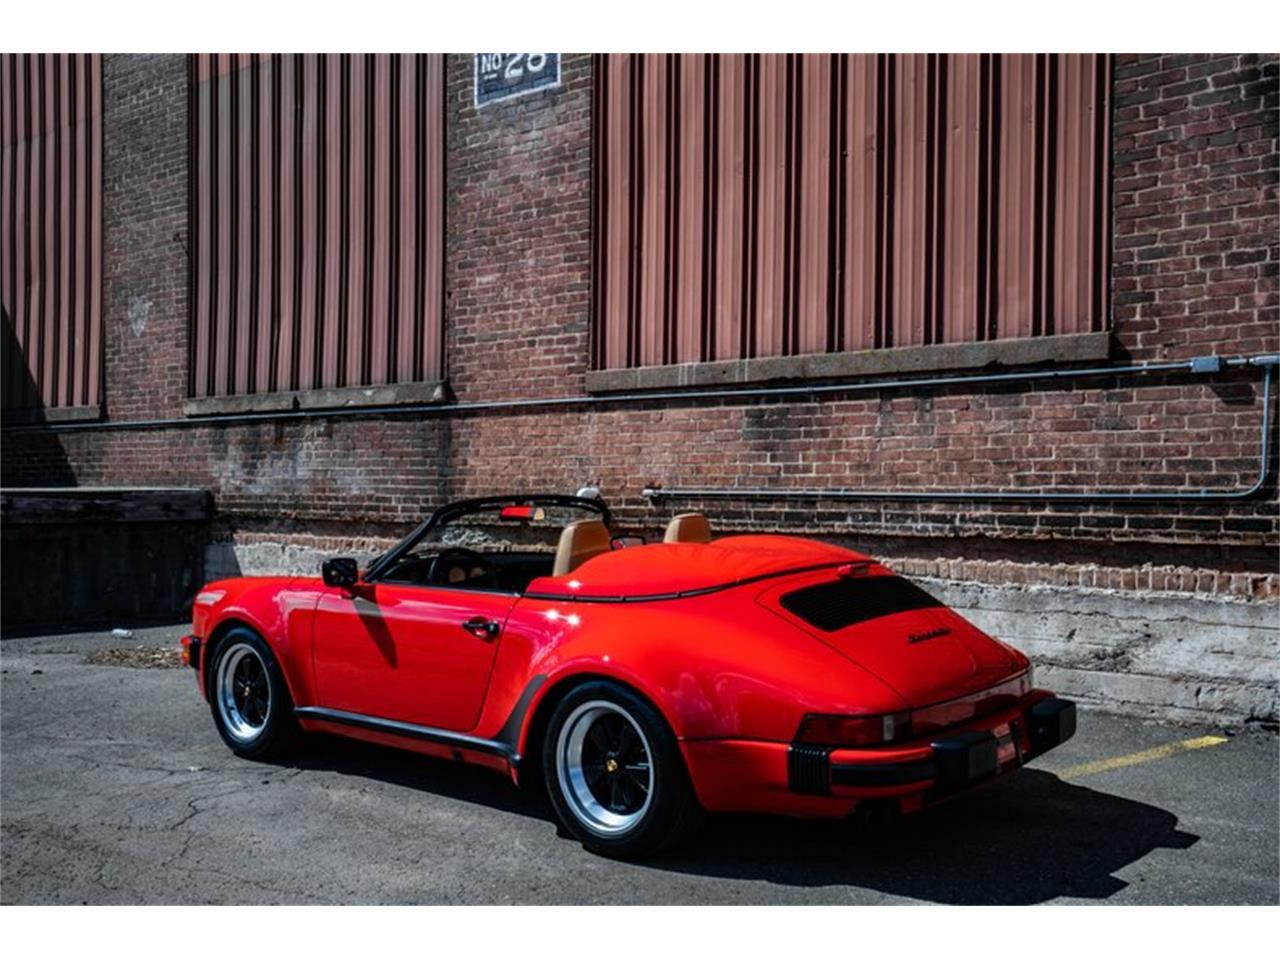 1989 Porsche 911 Speedster (CC-1201897) for sale in Wallingford, Connecticut